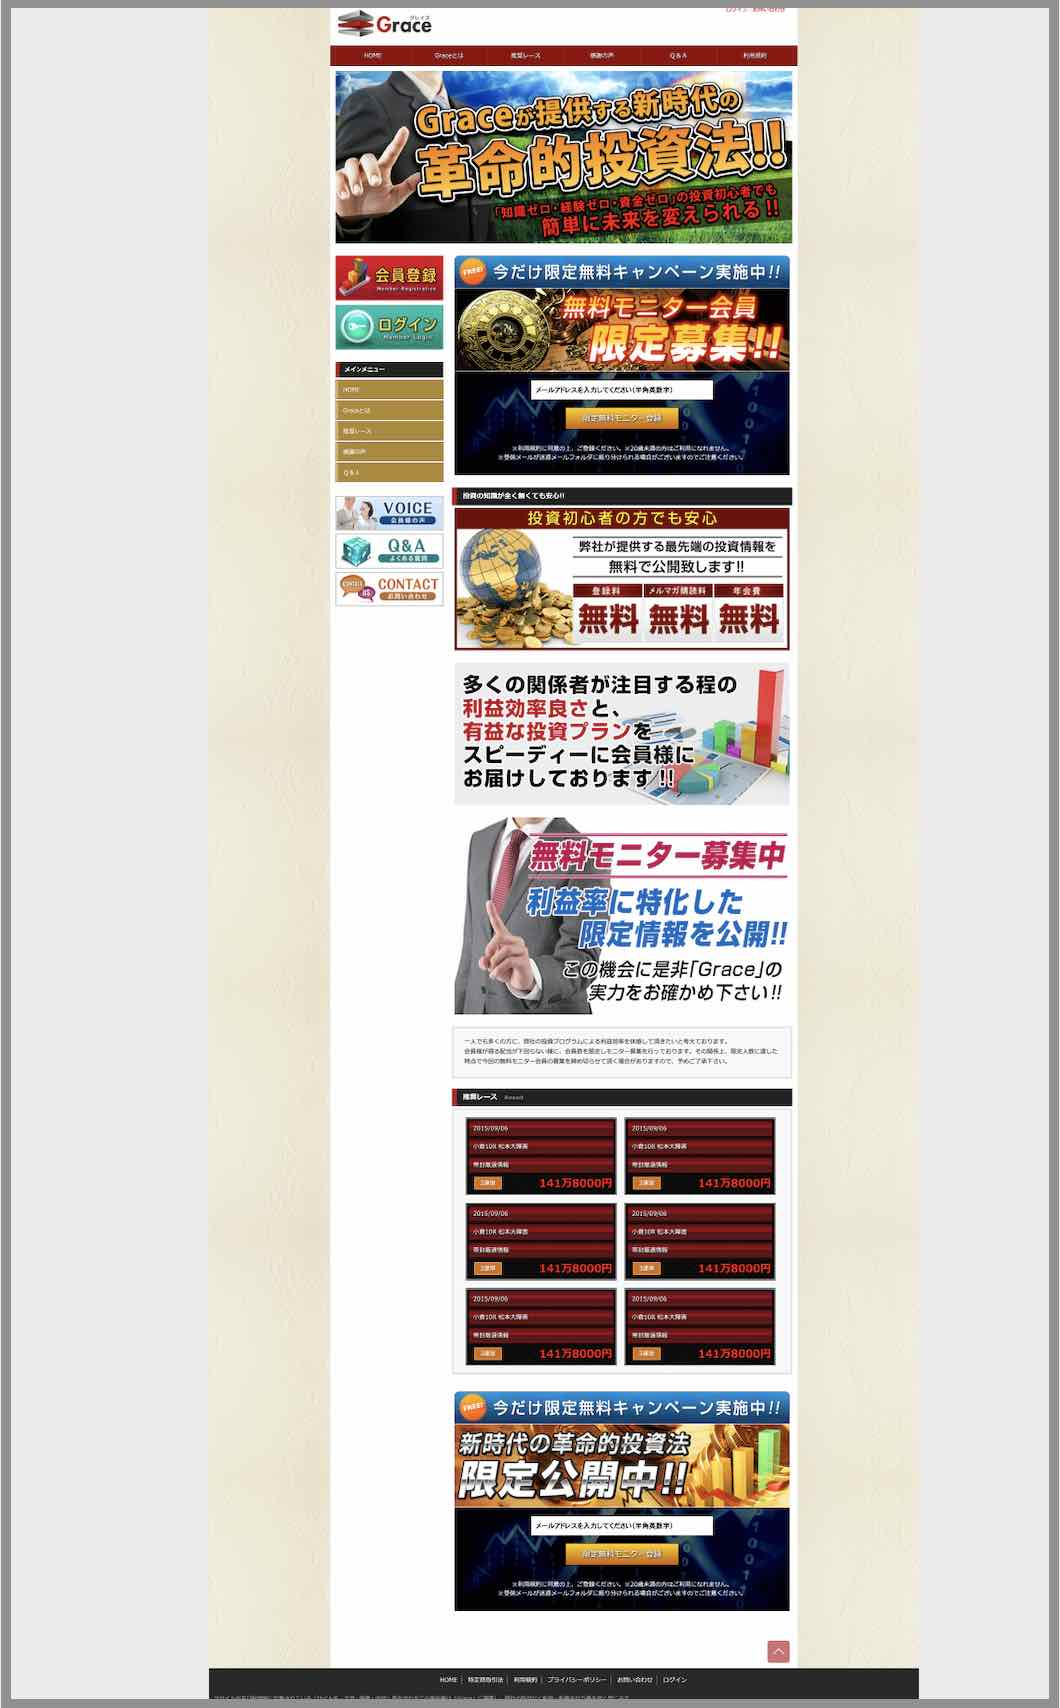 GRACE(グレイス)という競馬予想サイトの非会員TOP